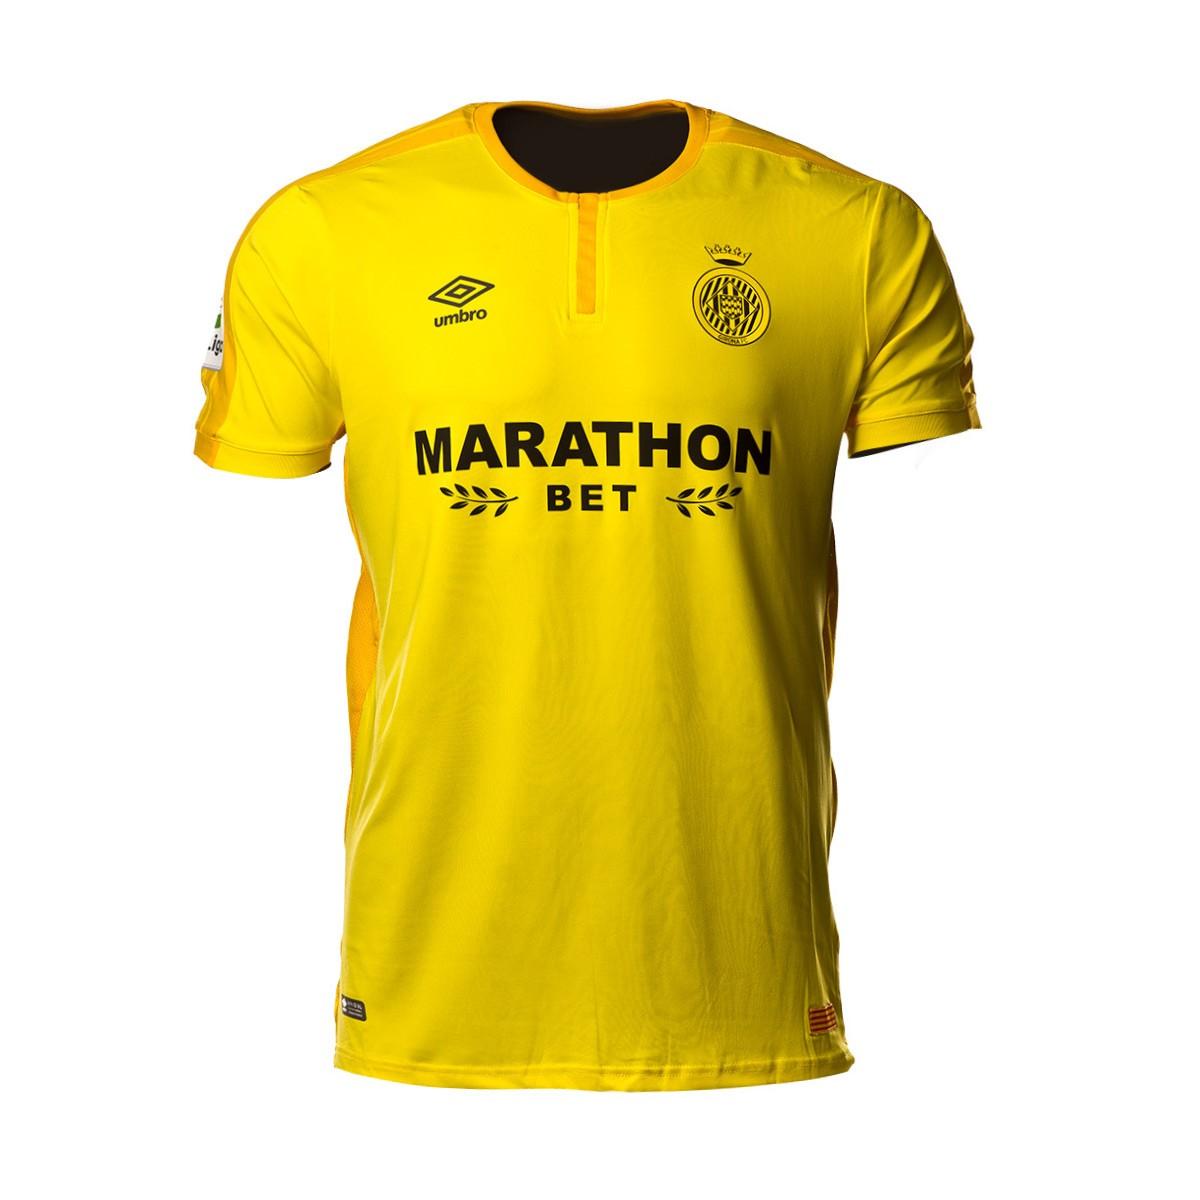 9c0350cfab663 Camiseta Umbro Girona FC Segunda Equipación 2018-2019 White - Tienda de  fútbol Fútbol Emotion